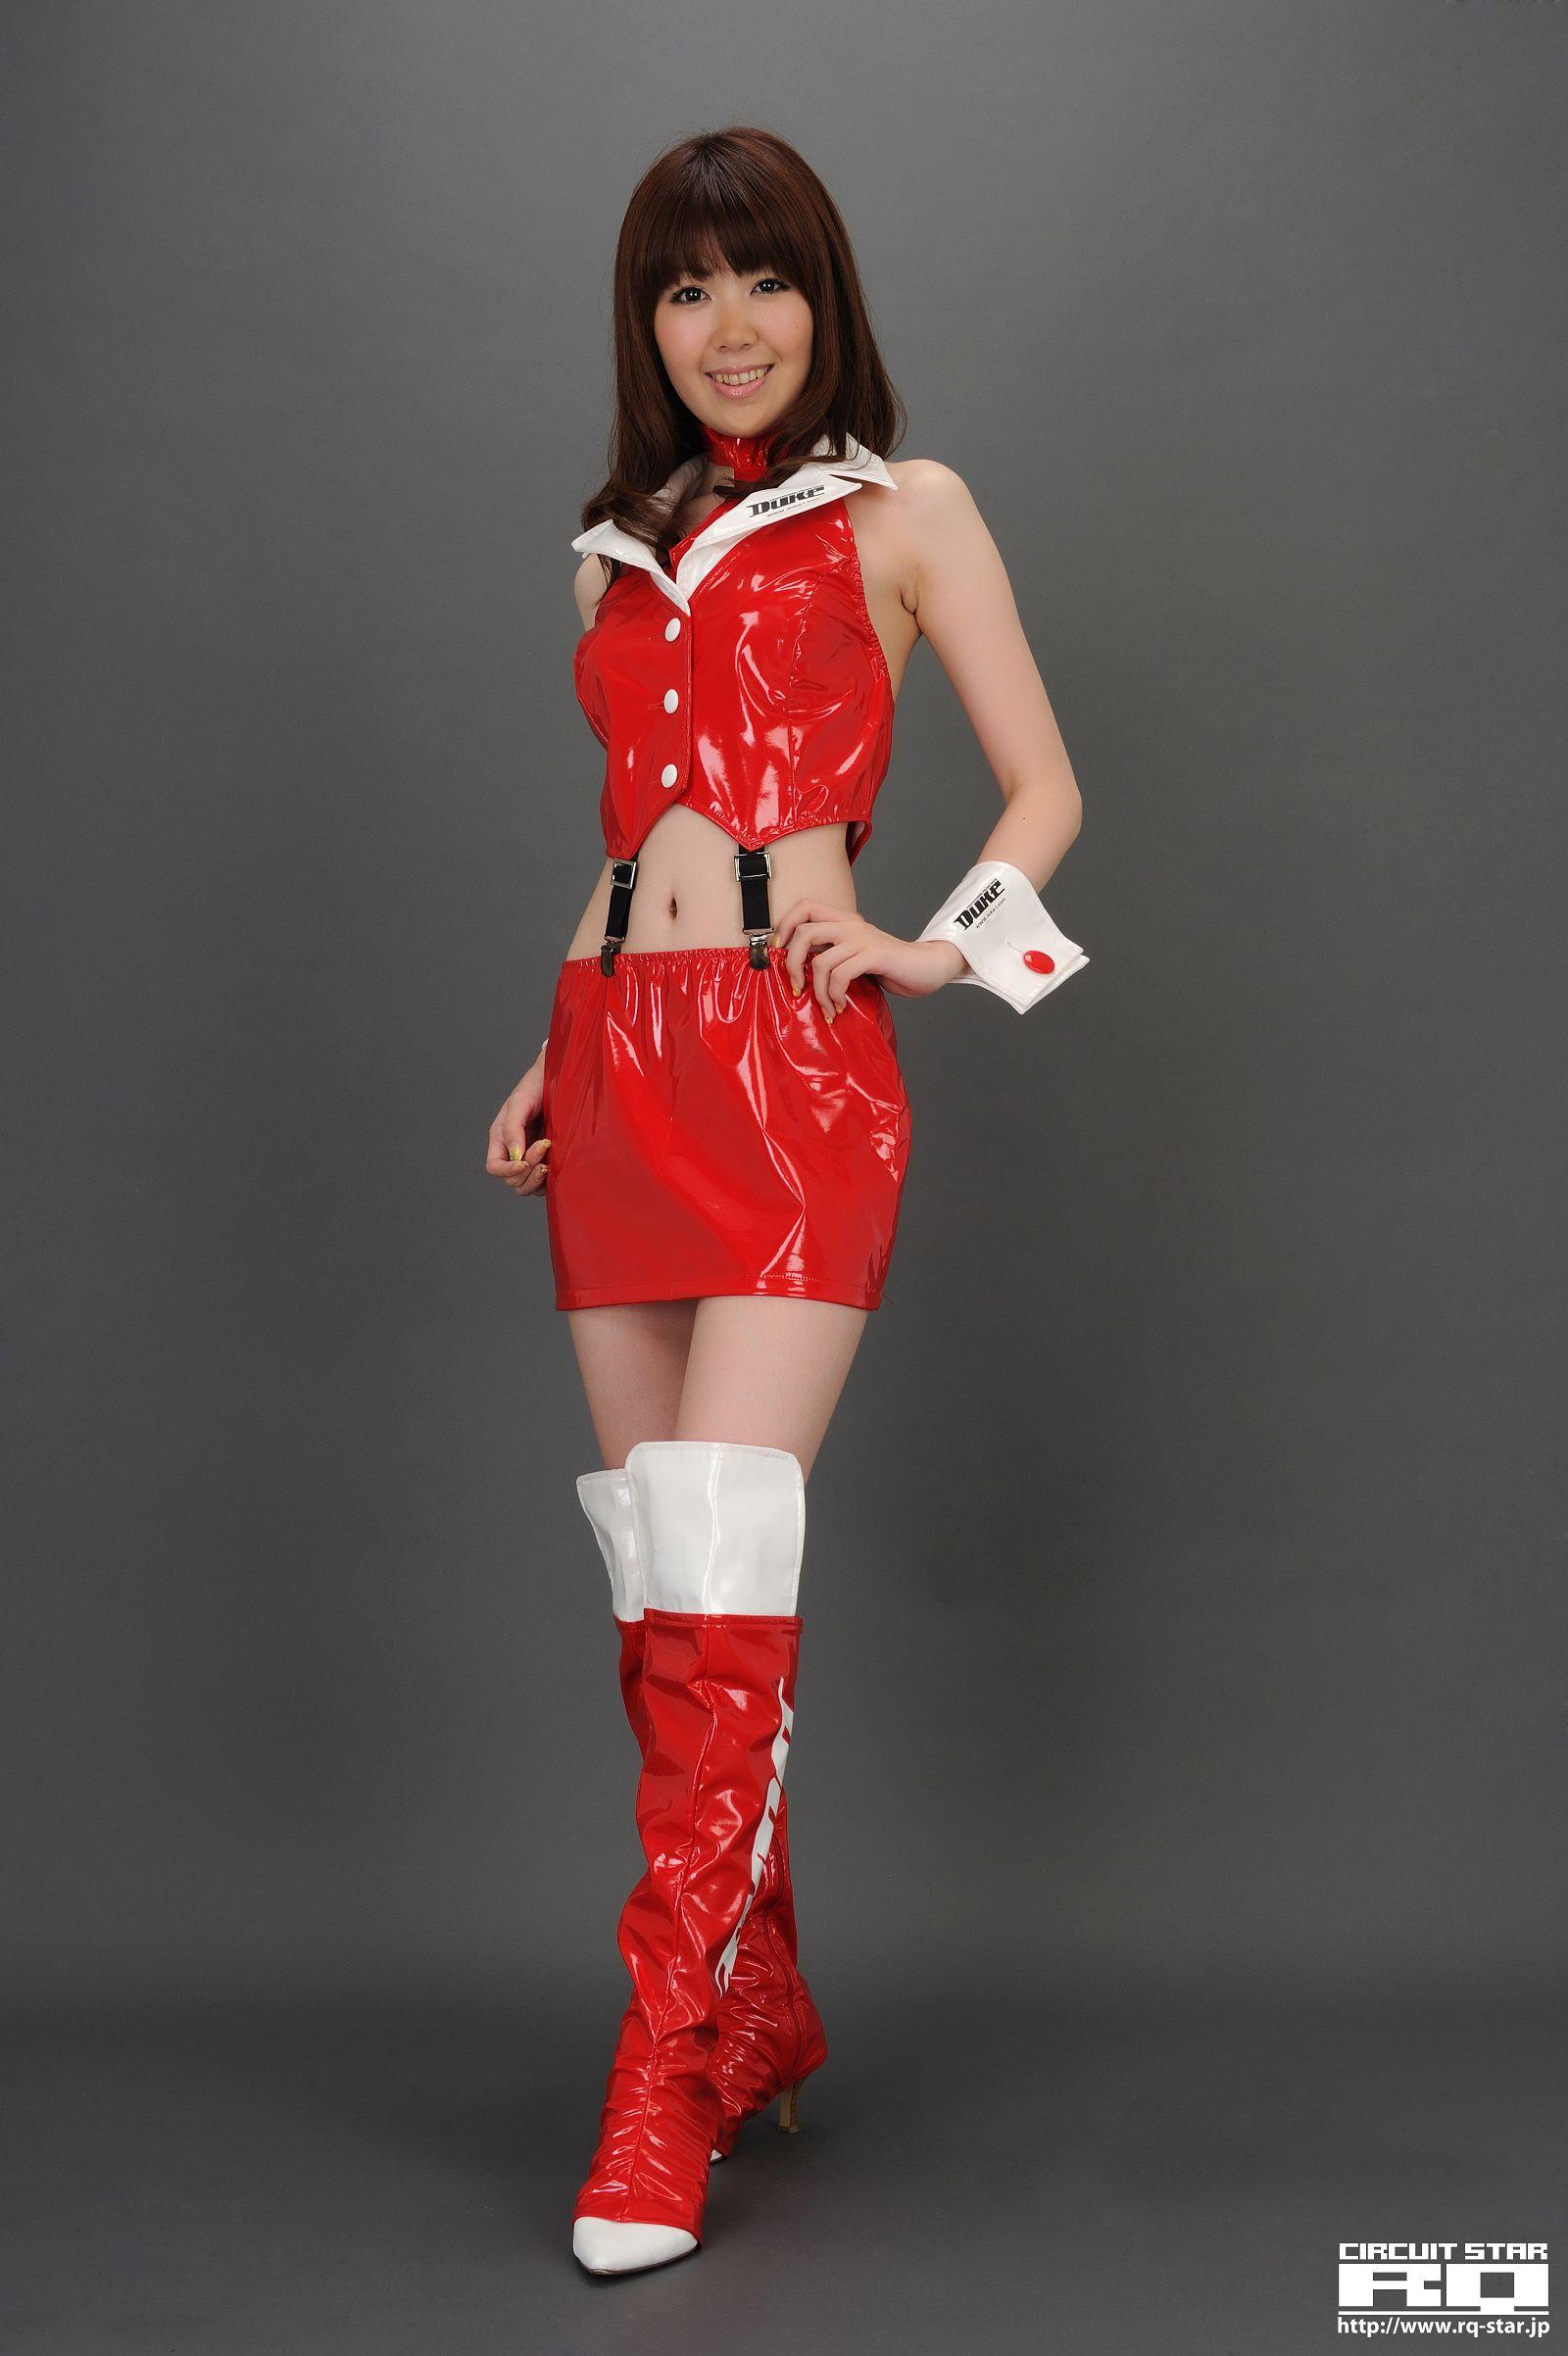 [RQ STAR美女] NO.0387 Haruka Ikuta 生田晴香 Race Queen[120P] RQ STAR 第1张